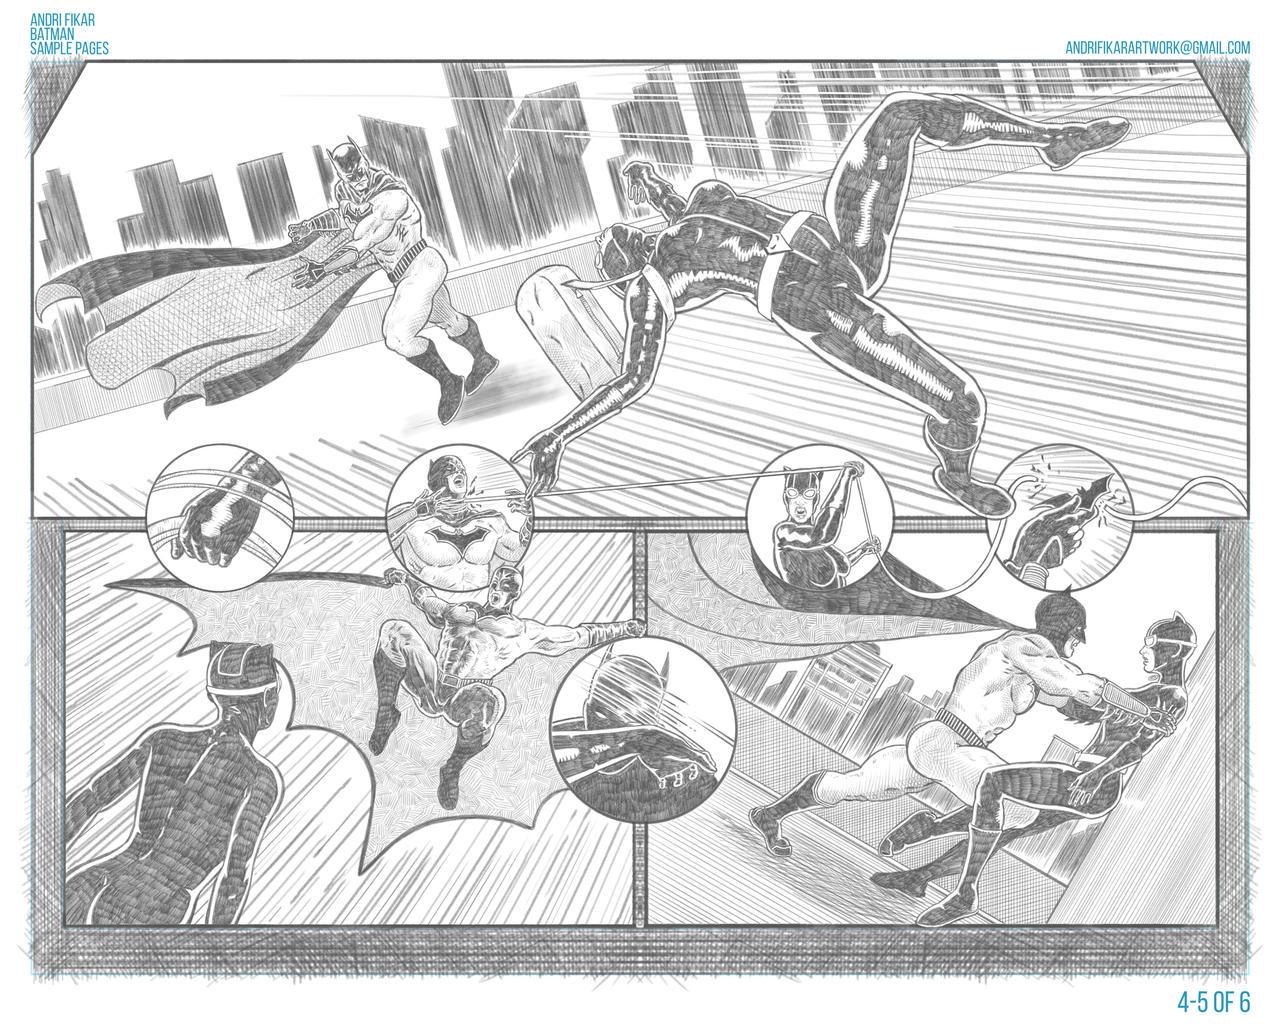 [Image: batman_sample_pages_4_5_of_6_by_fixart-dc7kxgj.jpg]